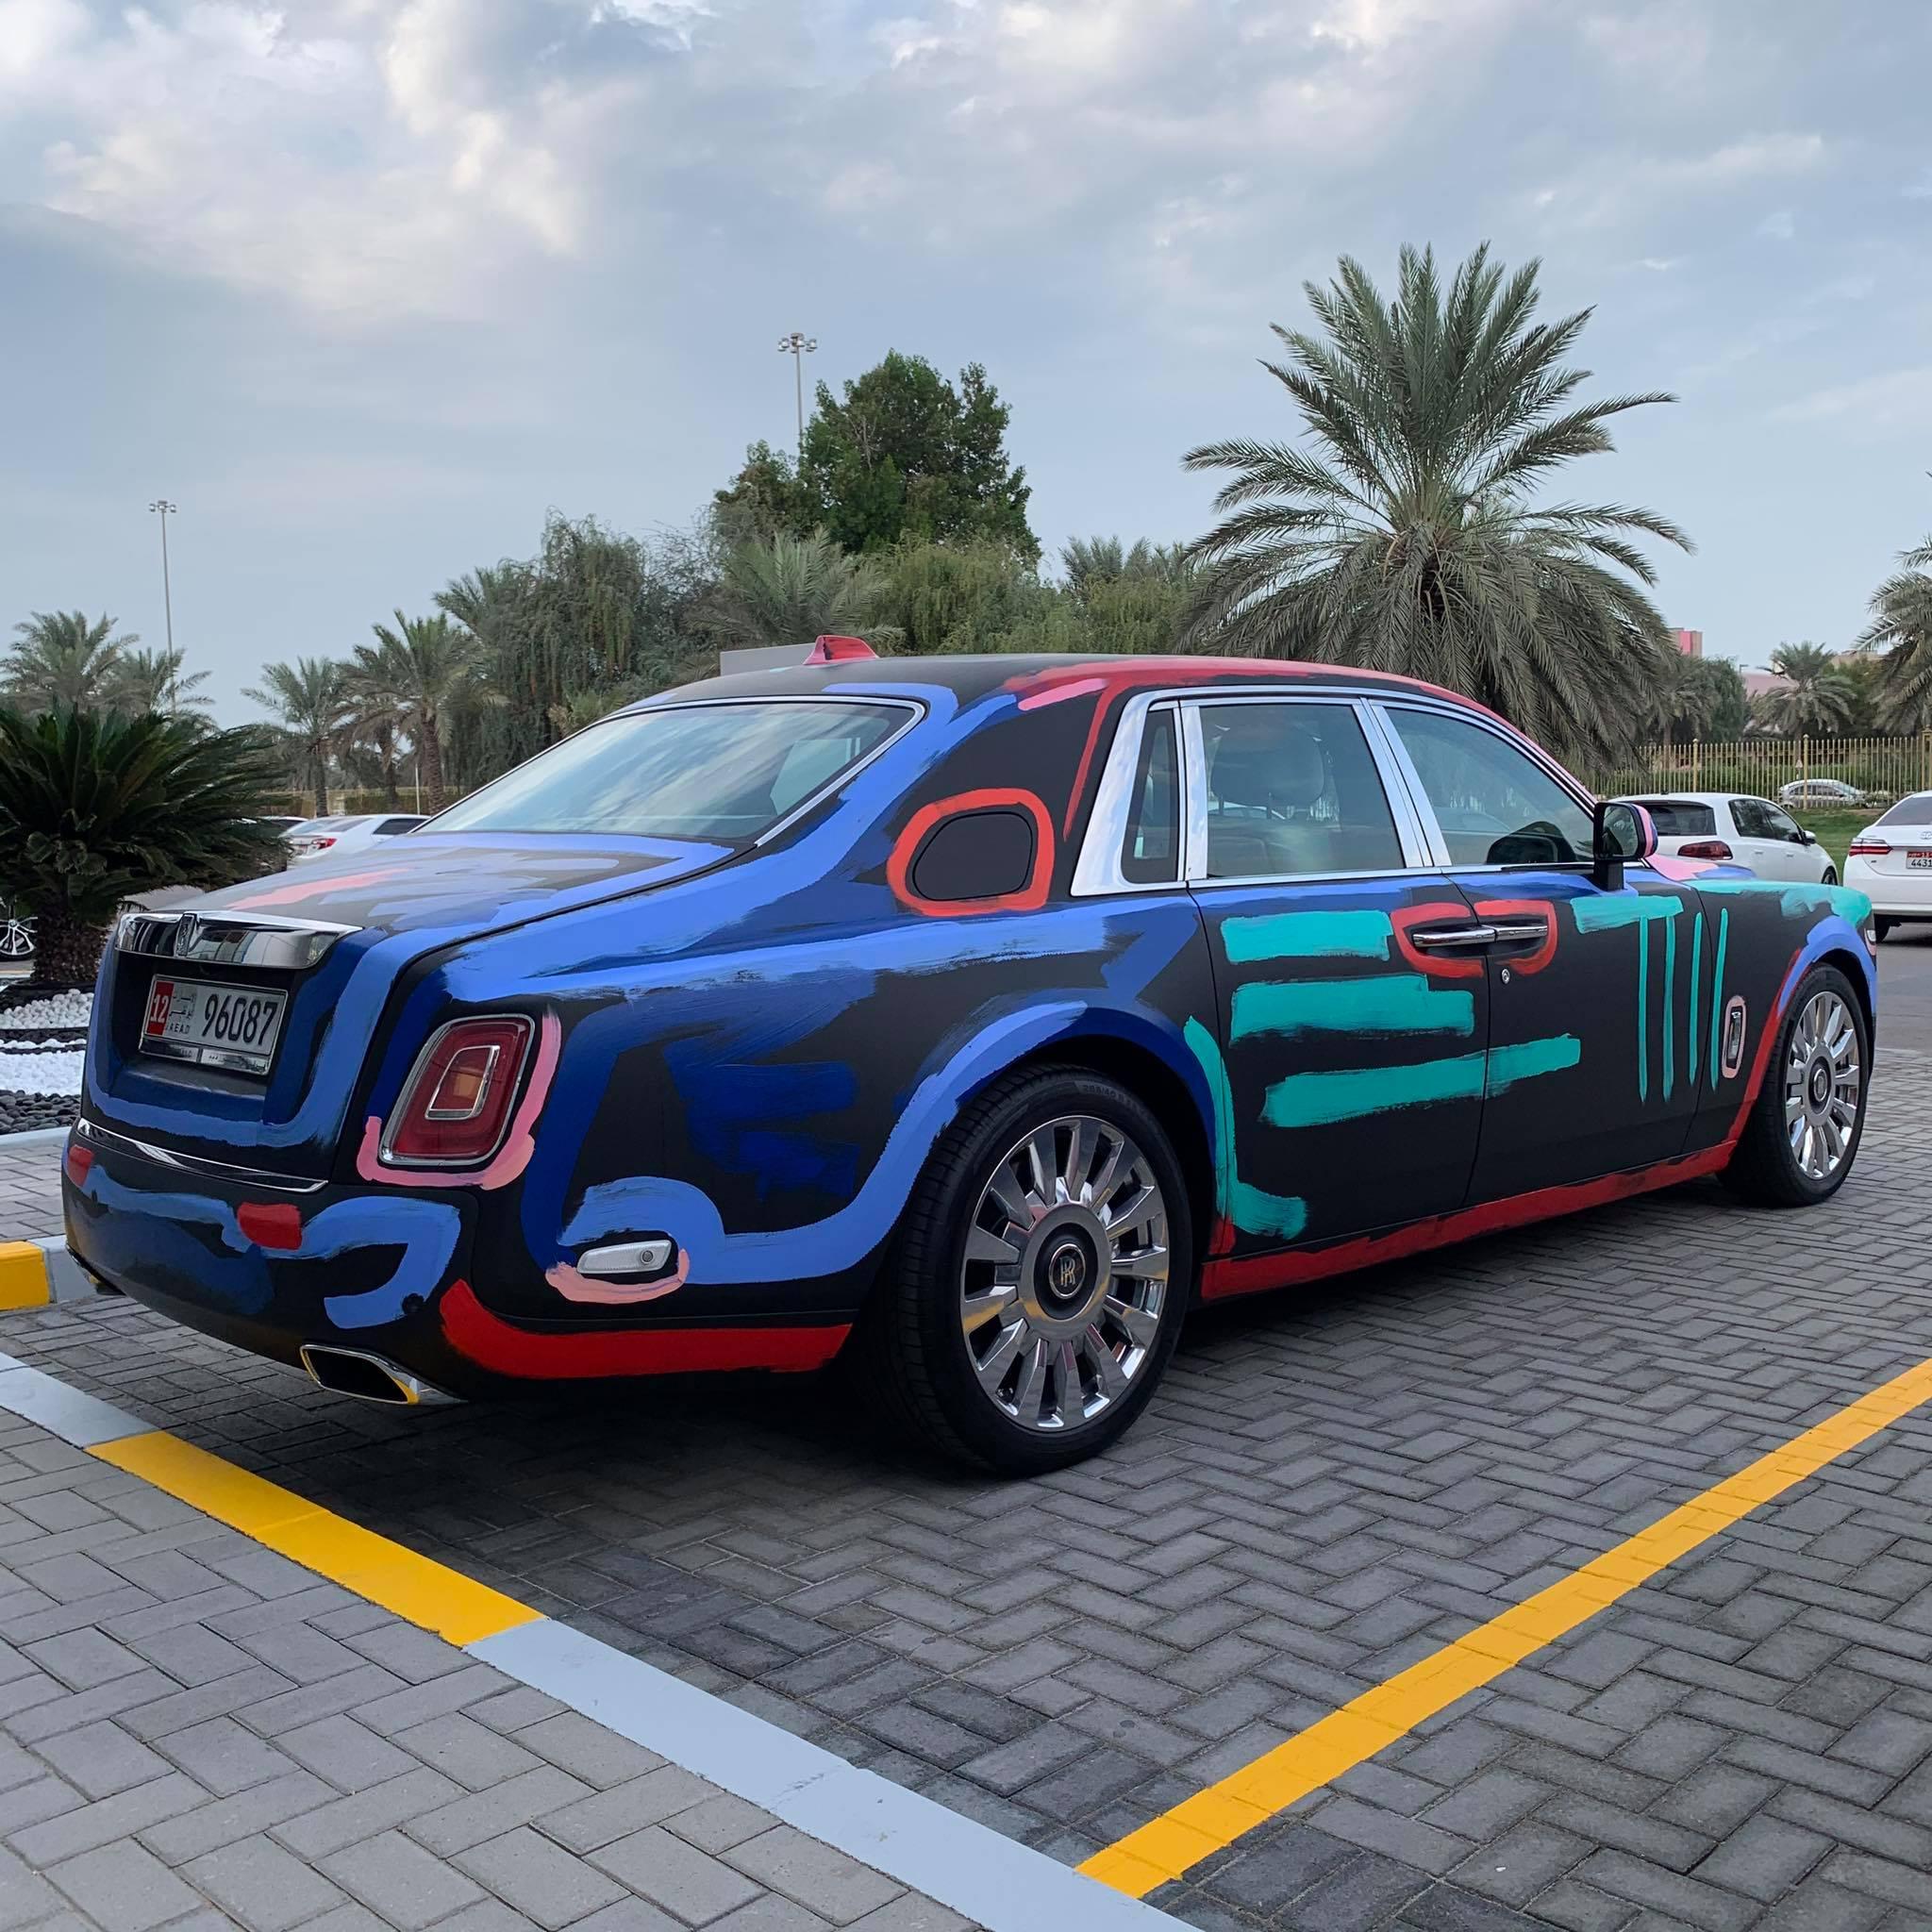 Rolls-Royce_Phantom_Bradley_Theodore_0003